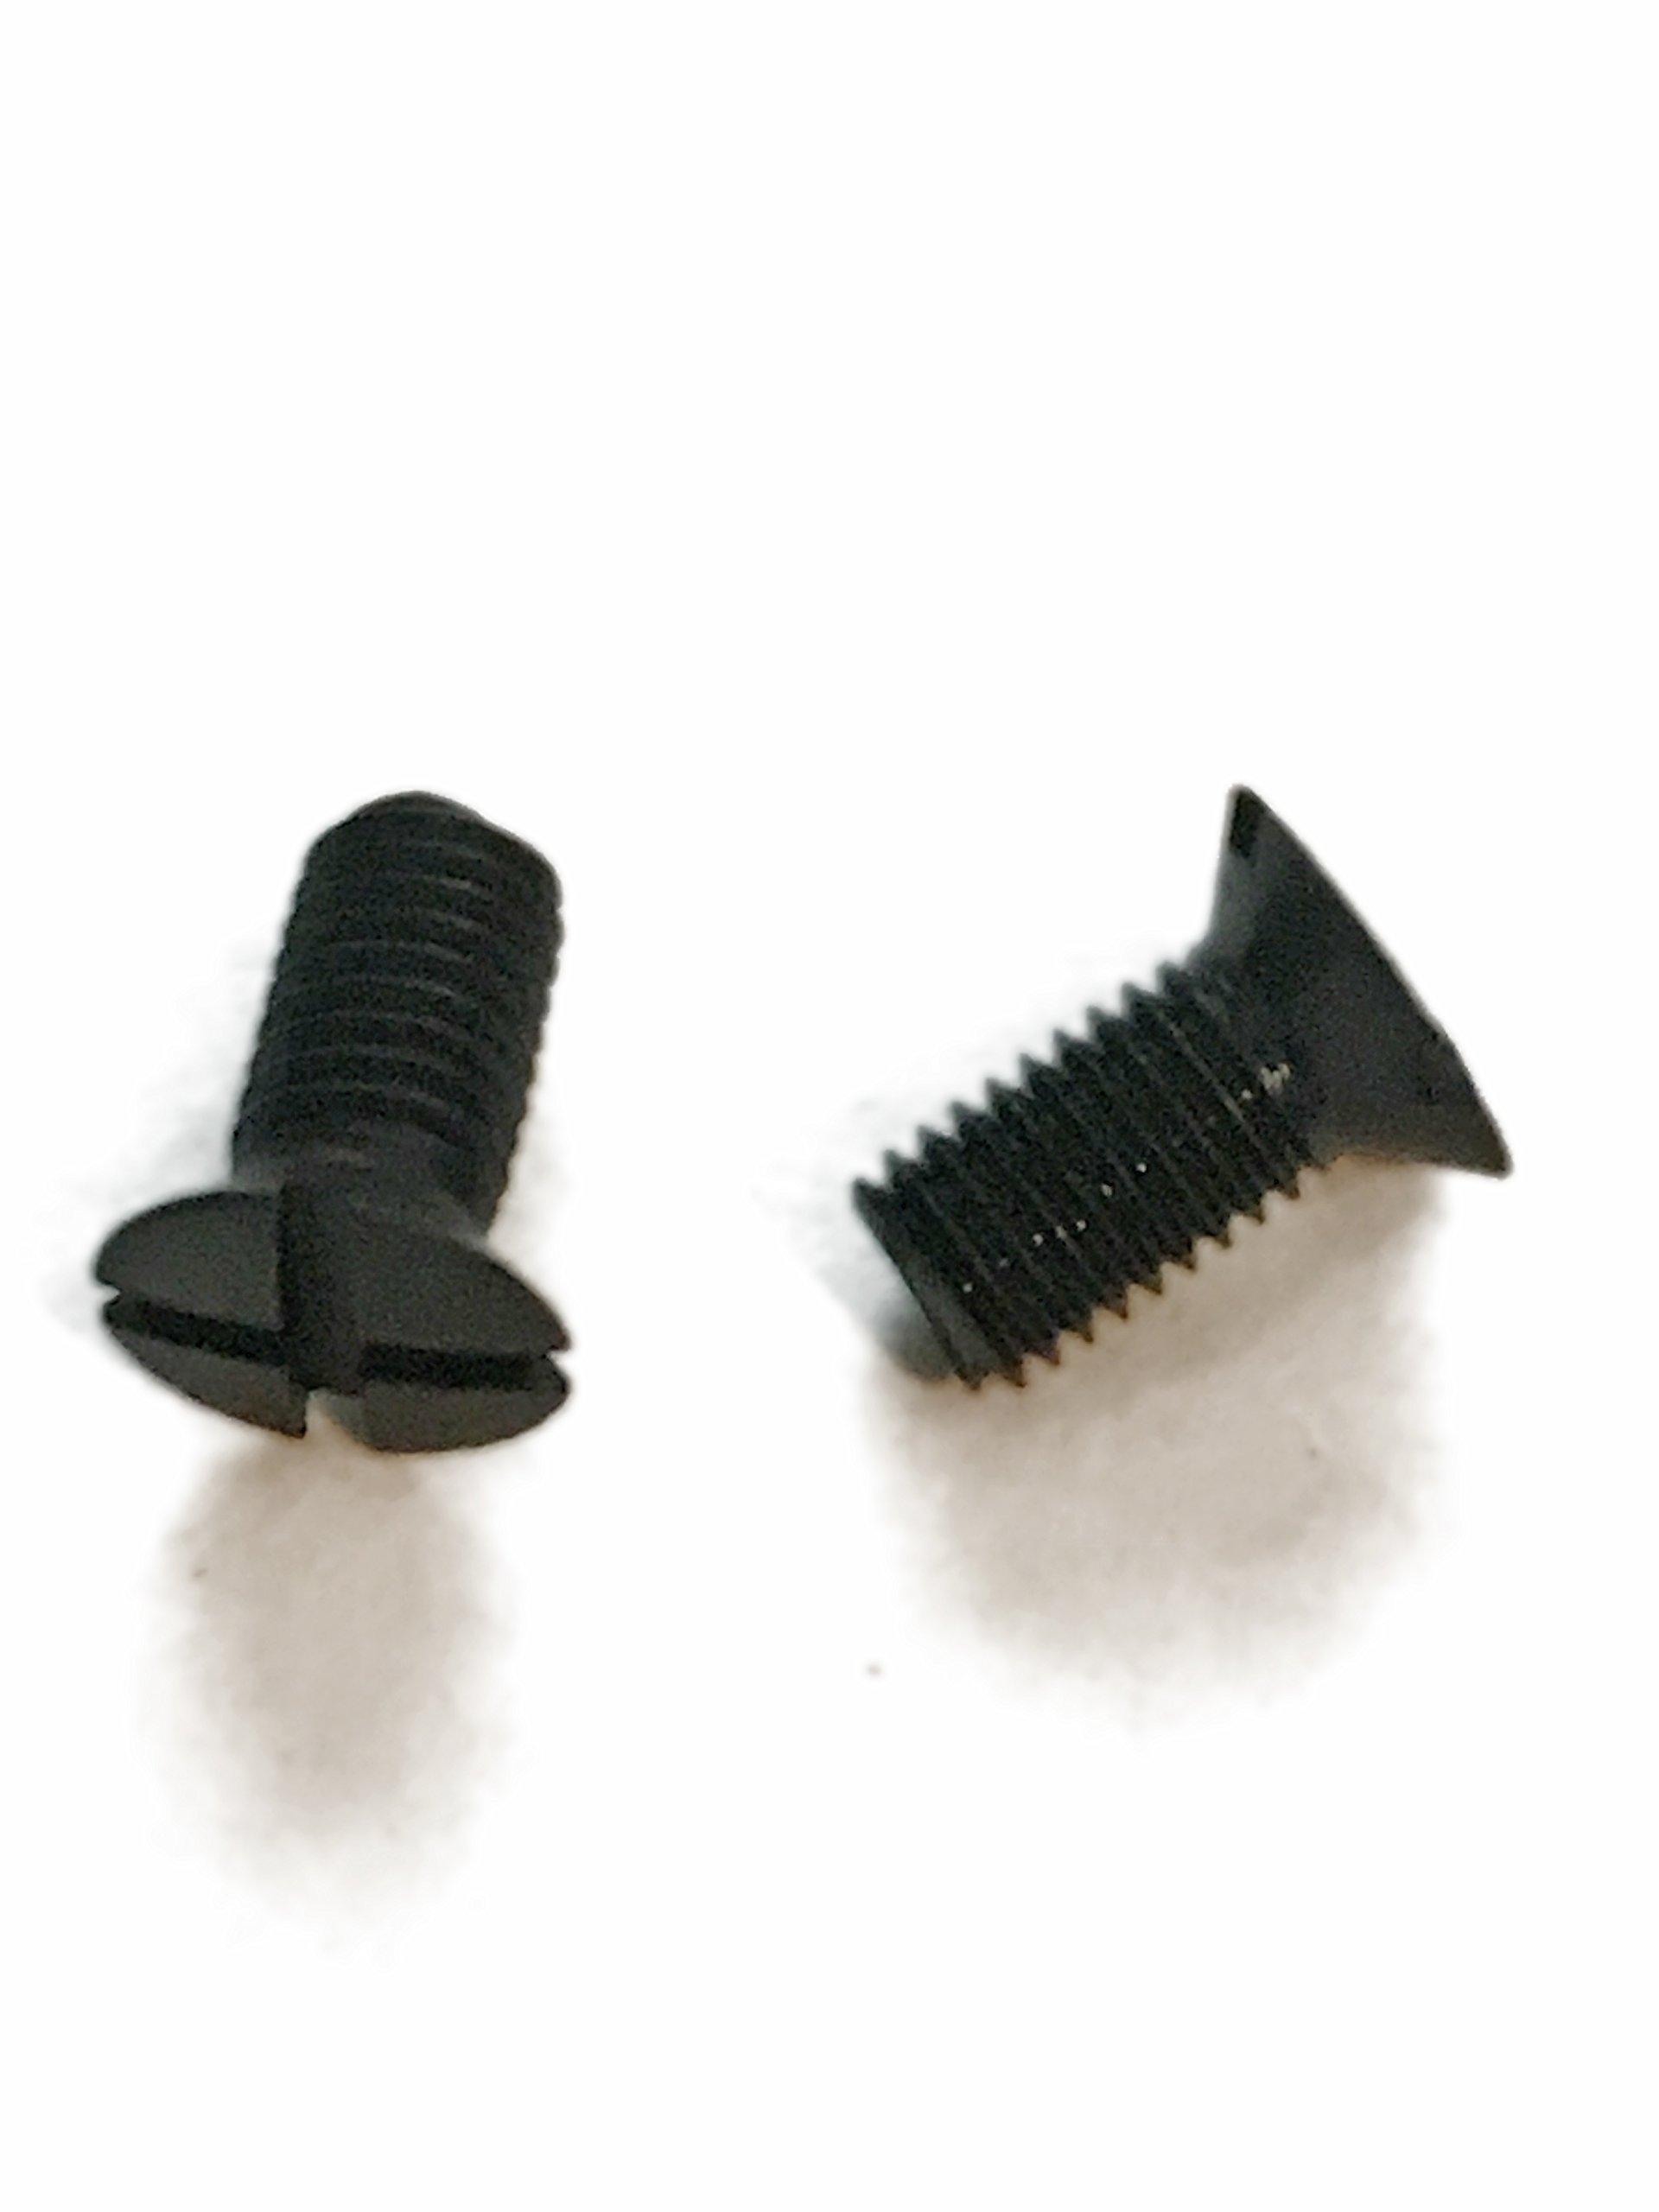 "Juki Original Genuine Part - ""NEEDLE PLATE SCREW"" for Juki Single Needle Industrial Sewing Machines (Set OF 2 Original Juki Brand)"